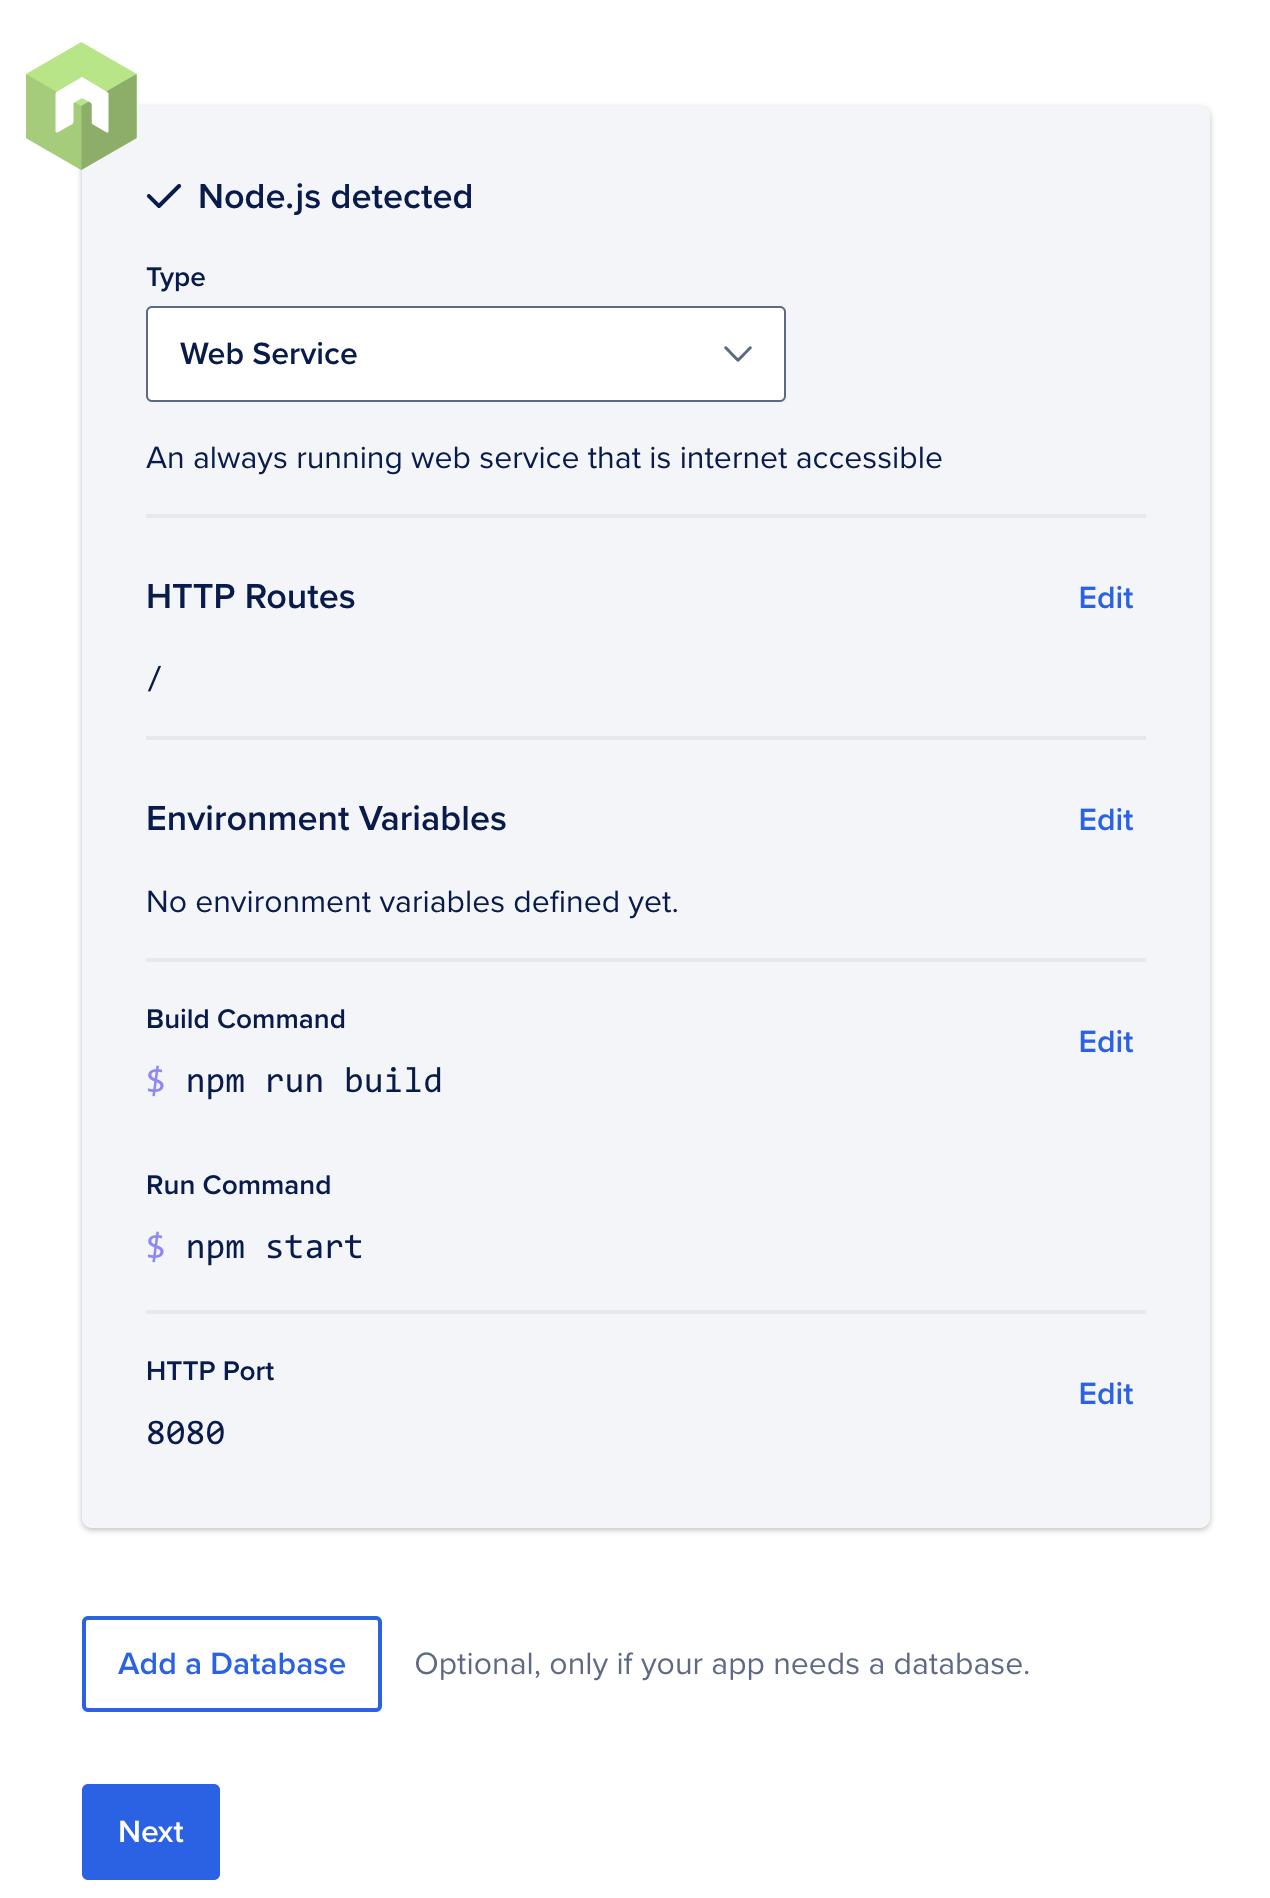 Choose Web Service